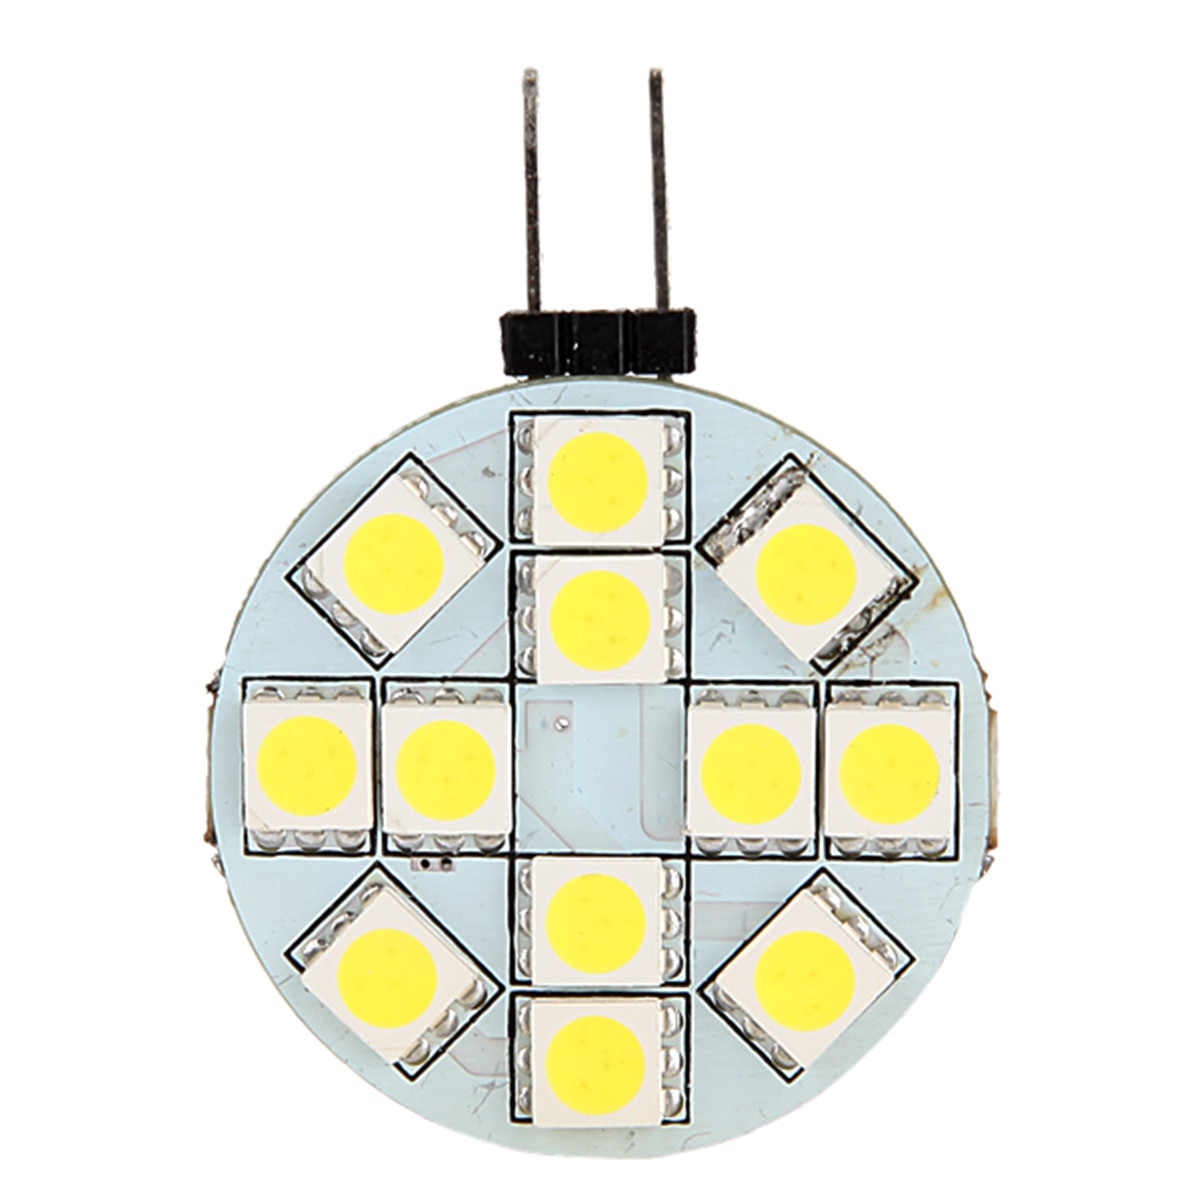 G4 12 SMD LED Bulb Lamp Pure White Light  5050 LED Bulb Lamp 12V Pure White Light